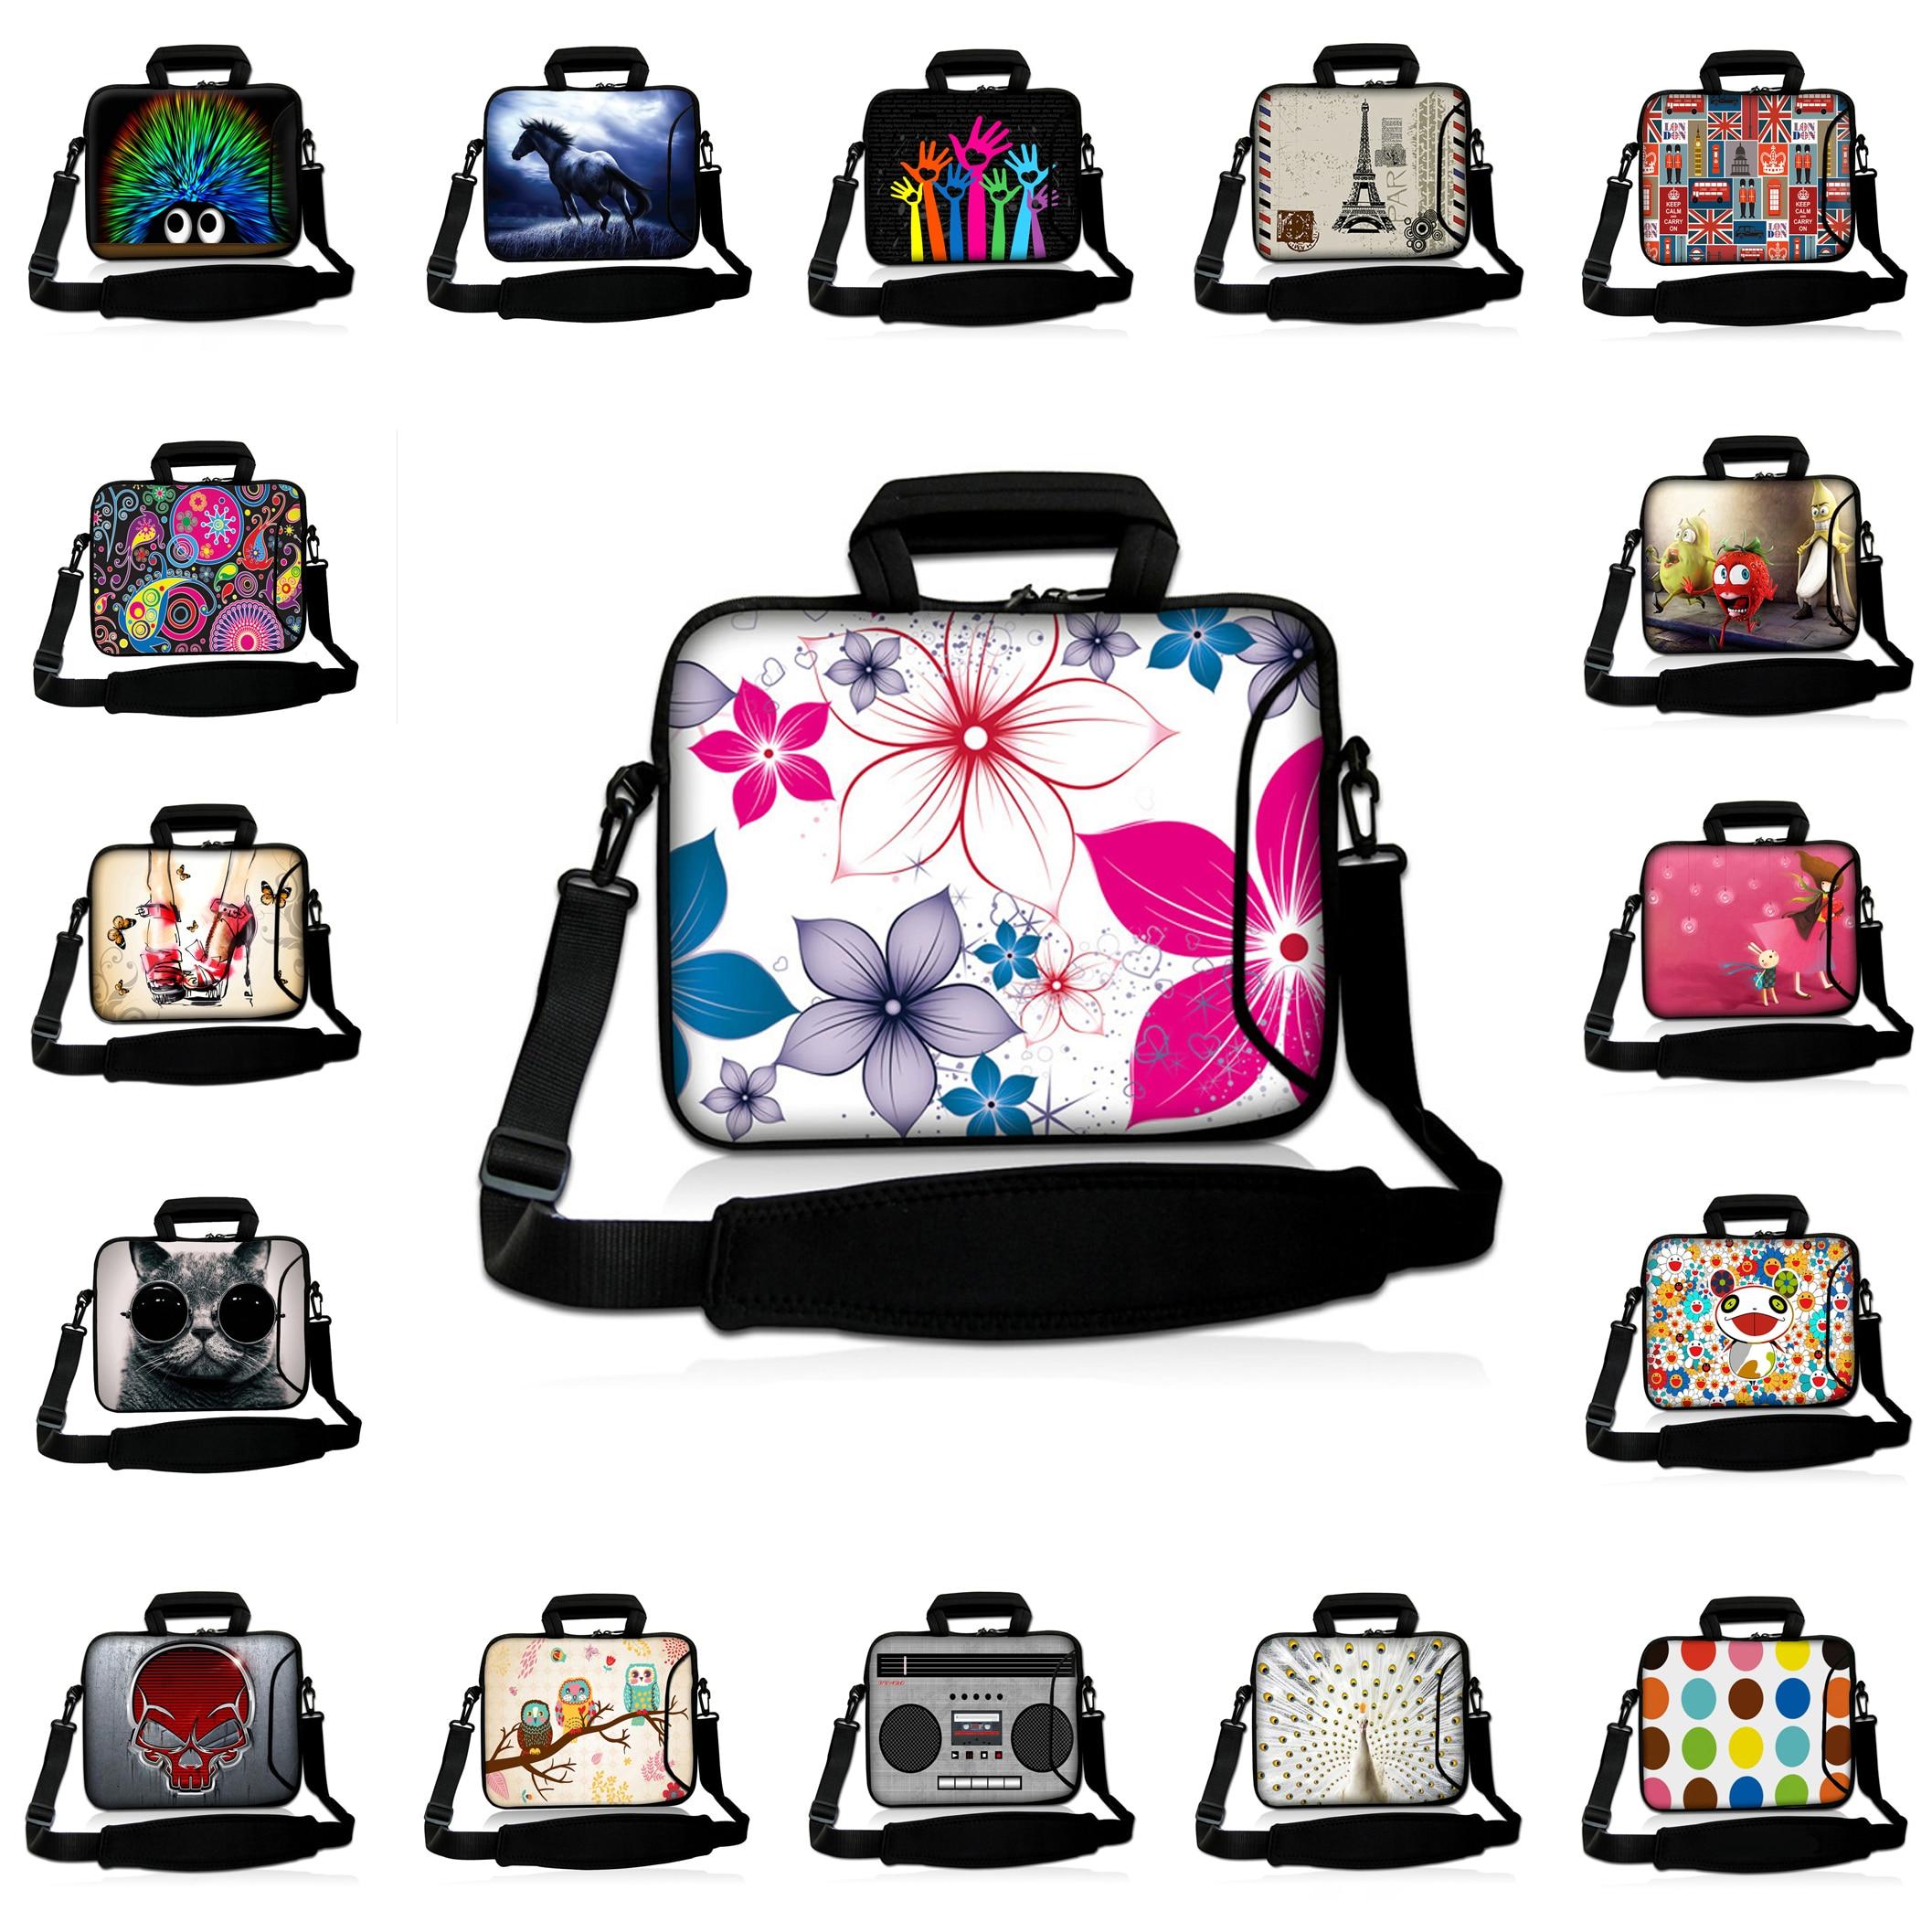 Notebook Shoulder Bags 10 Tablet 10.1 9.7 12 Netbook Nylon Briefcase 13.3 14 15.6 17 Waterproof Nylon Laptops Messenger Bag